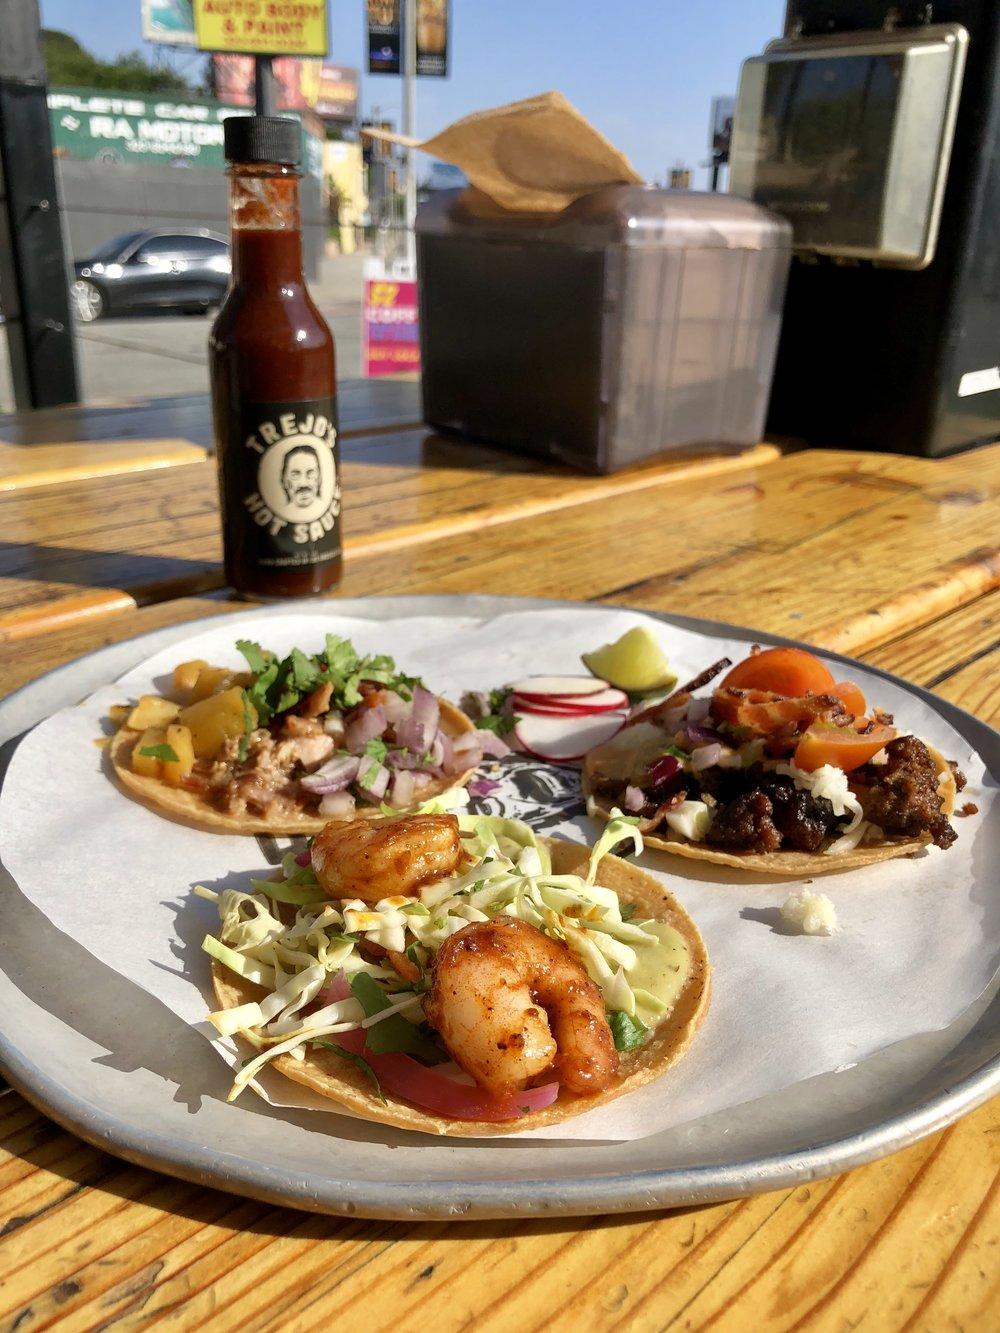 Taco Tuesday at Trejo's Tacos - Carnitas taco, spicy shrimp taco, cheeseburger taco.$2.50 each on Tue.